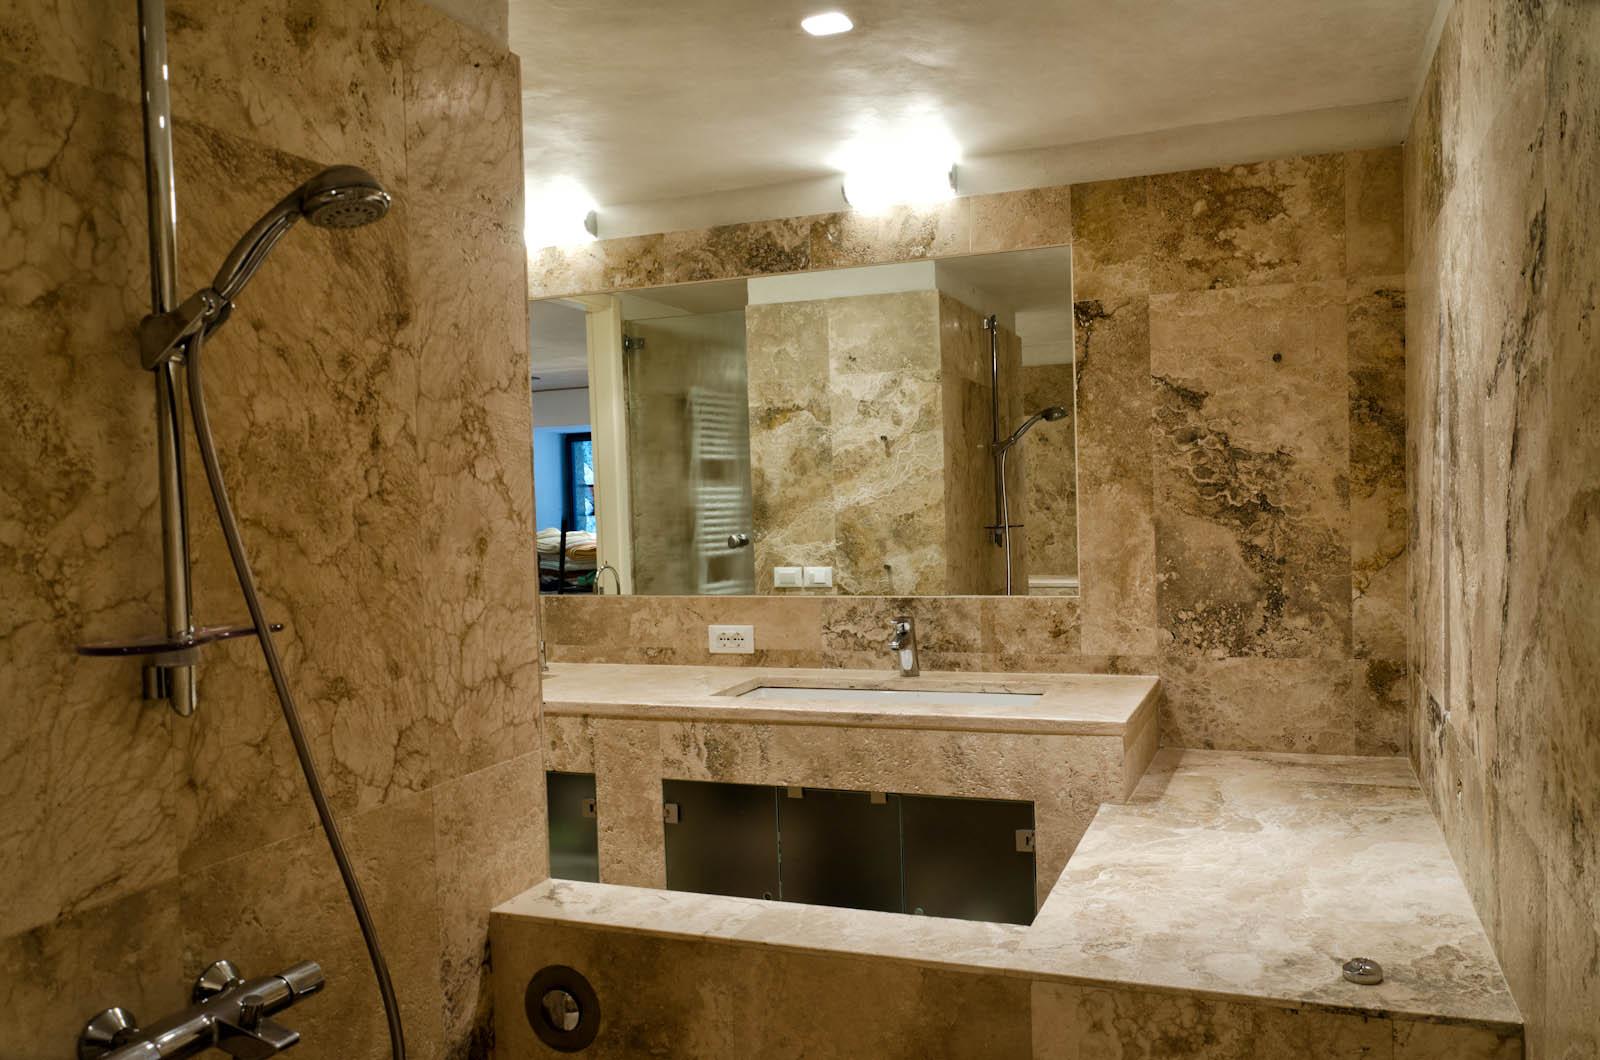 Bagno In Pietra Ricostruita : Foto bagni in pietra naturale bello arredo bagno pietra naturale